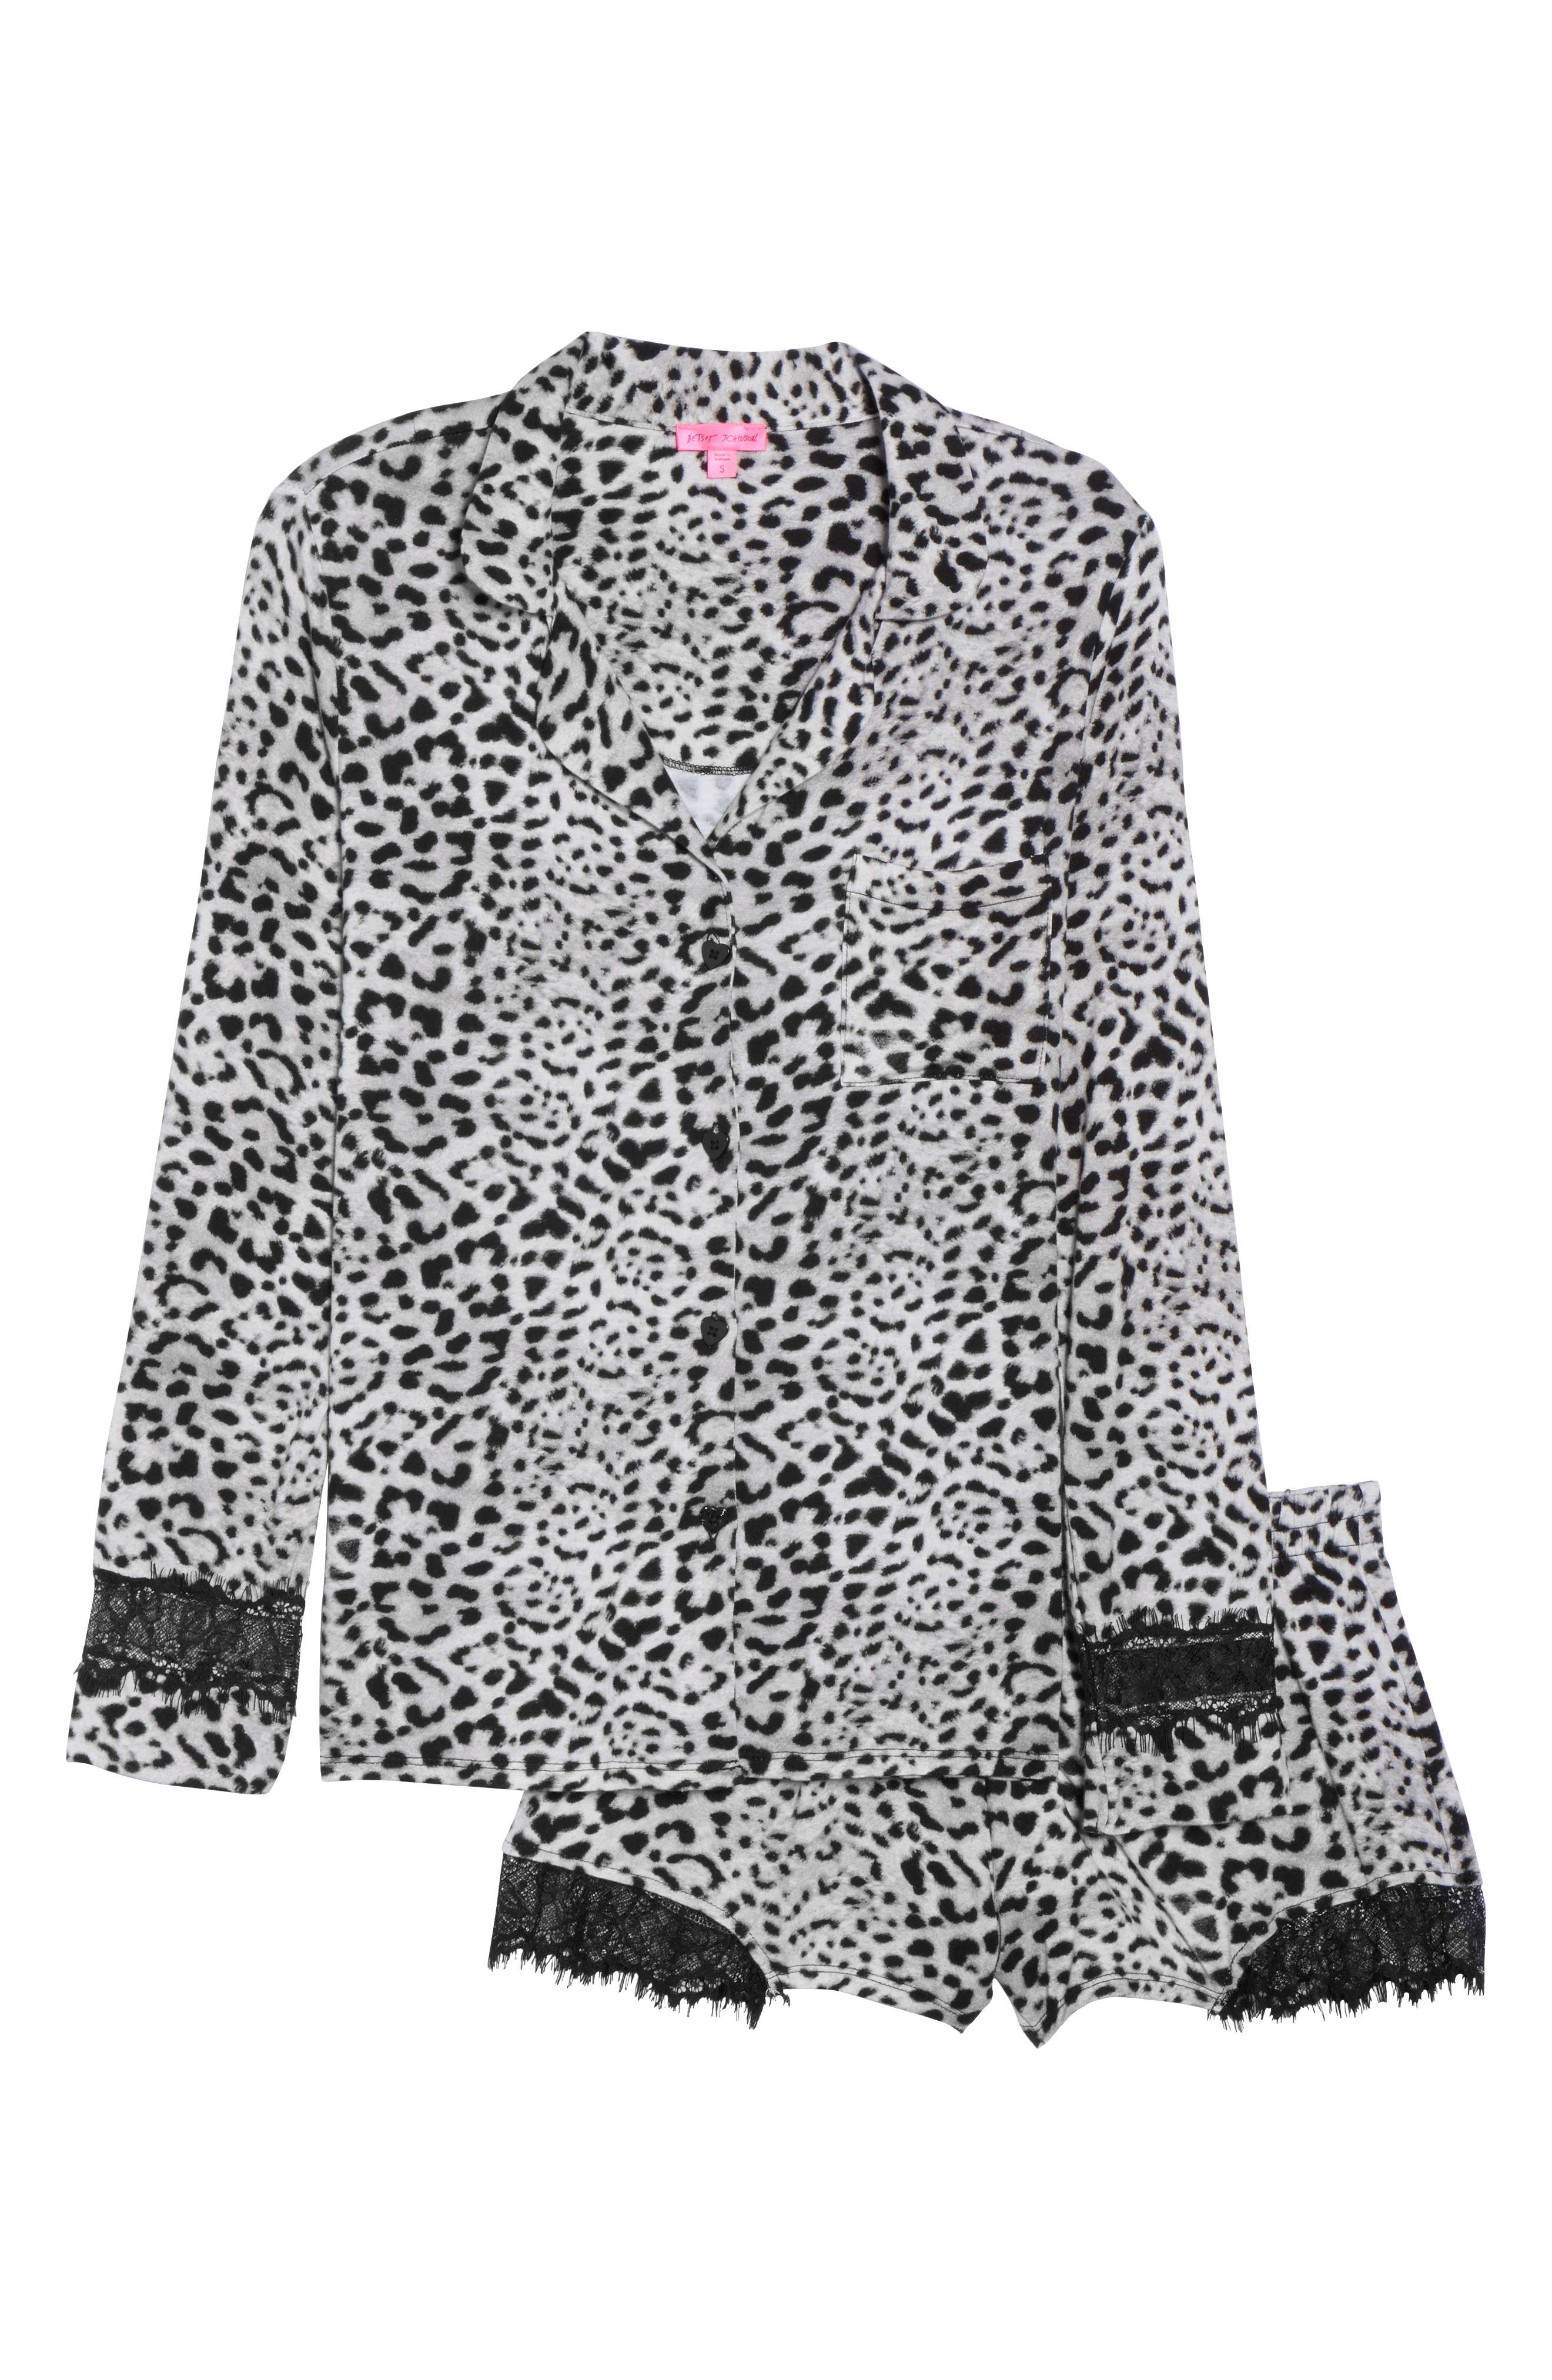 Notch Collar Short Pajamas,                             Alternate thumbnail 6, color,                             Silky Leopard Grey